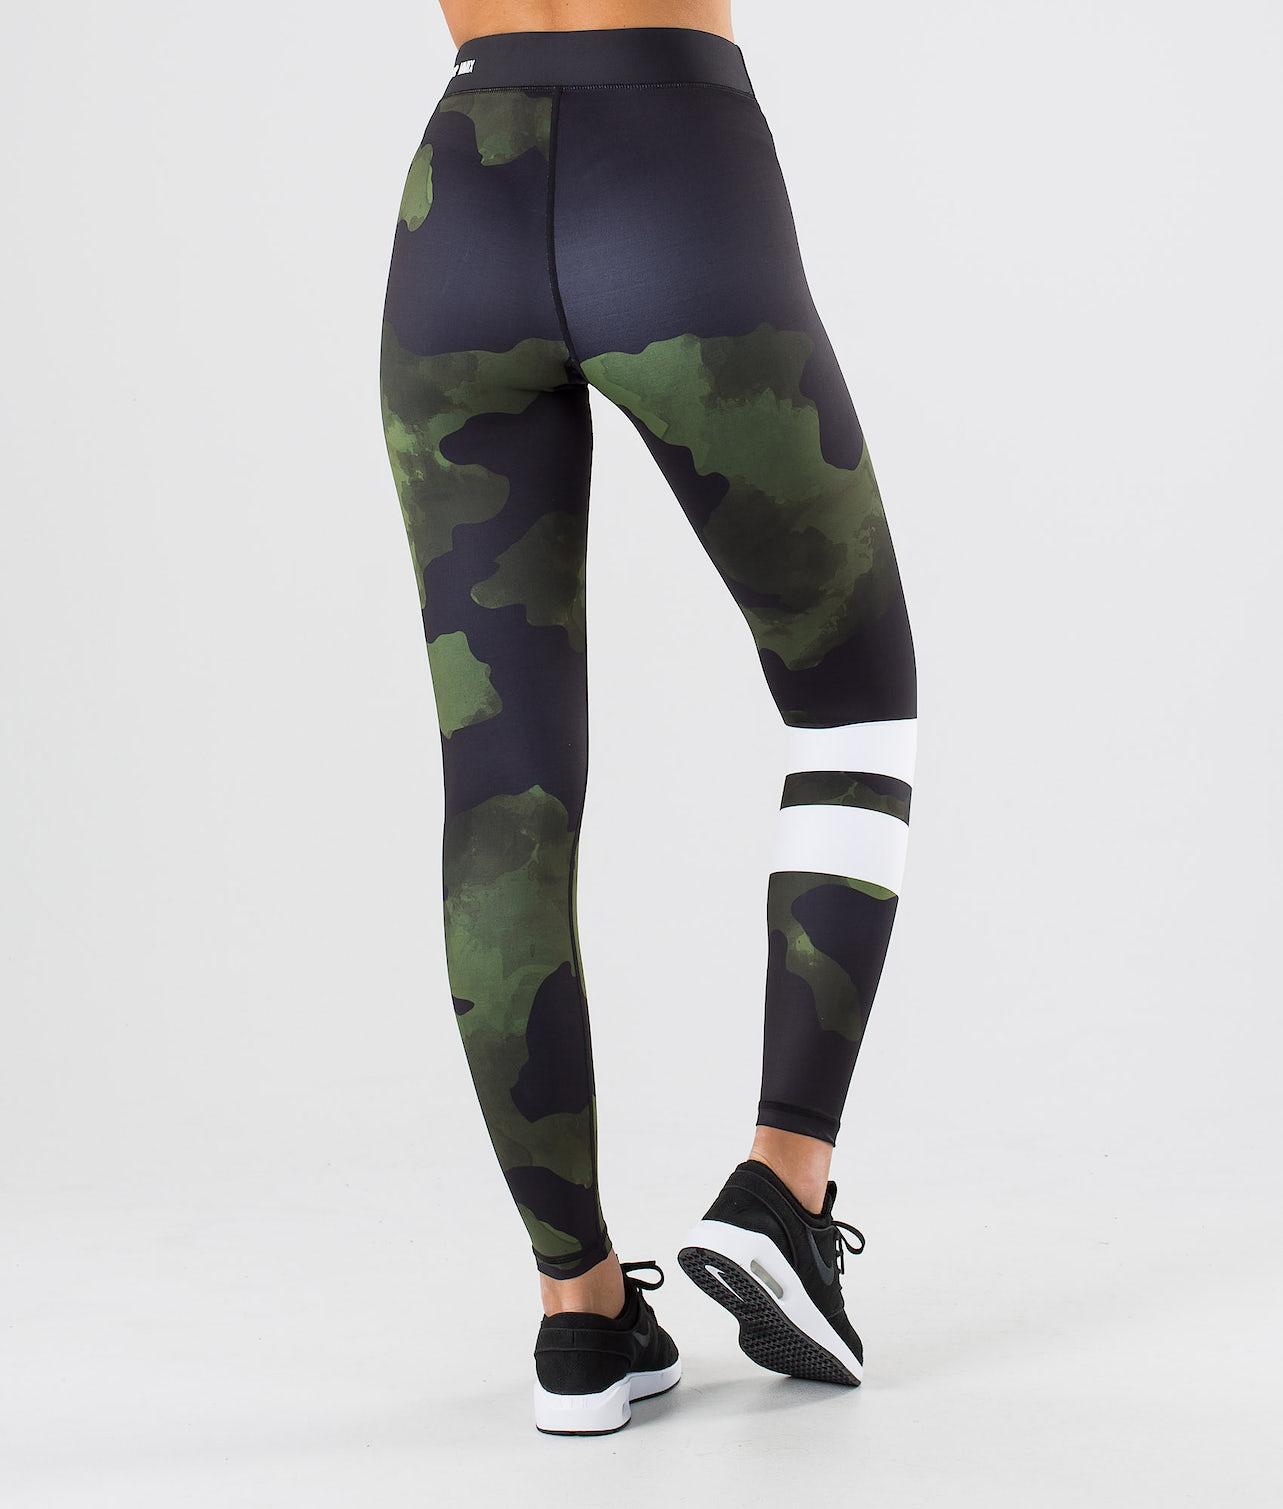 Dope Razor Leggings Green Camo